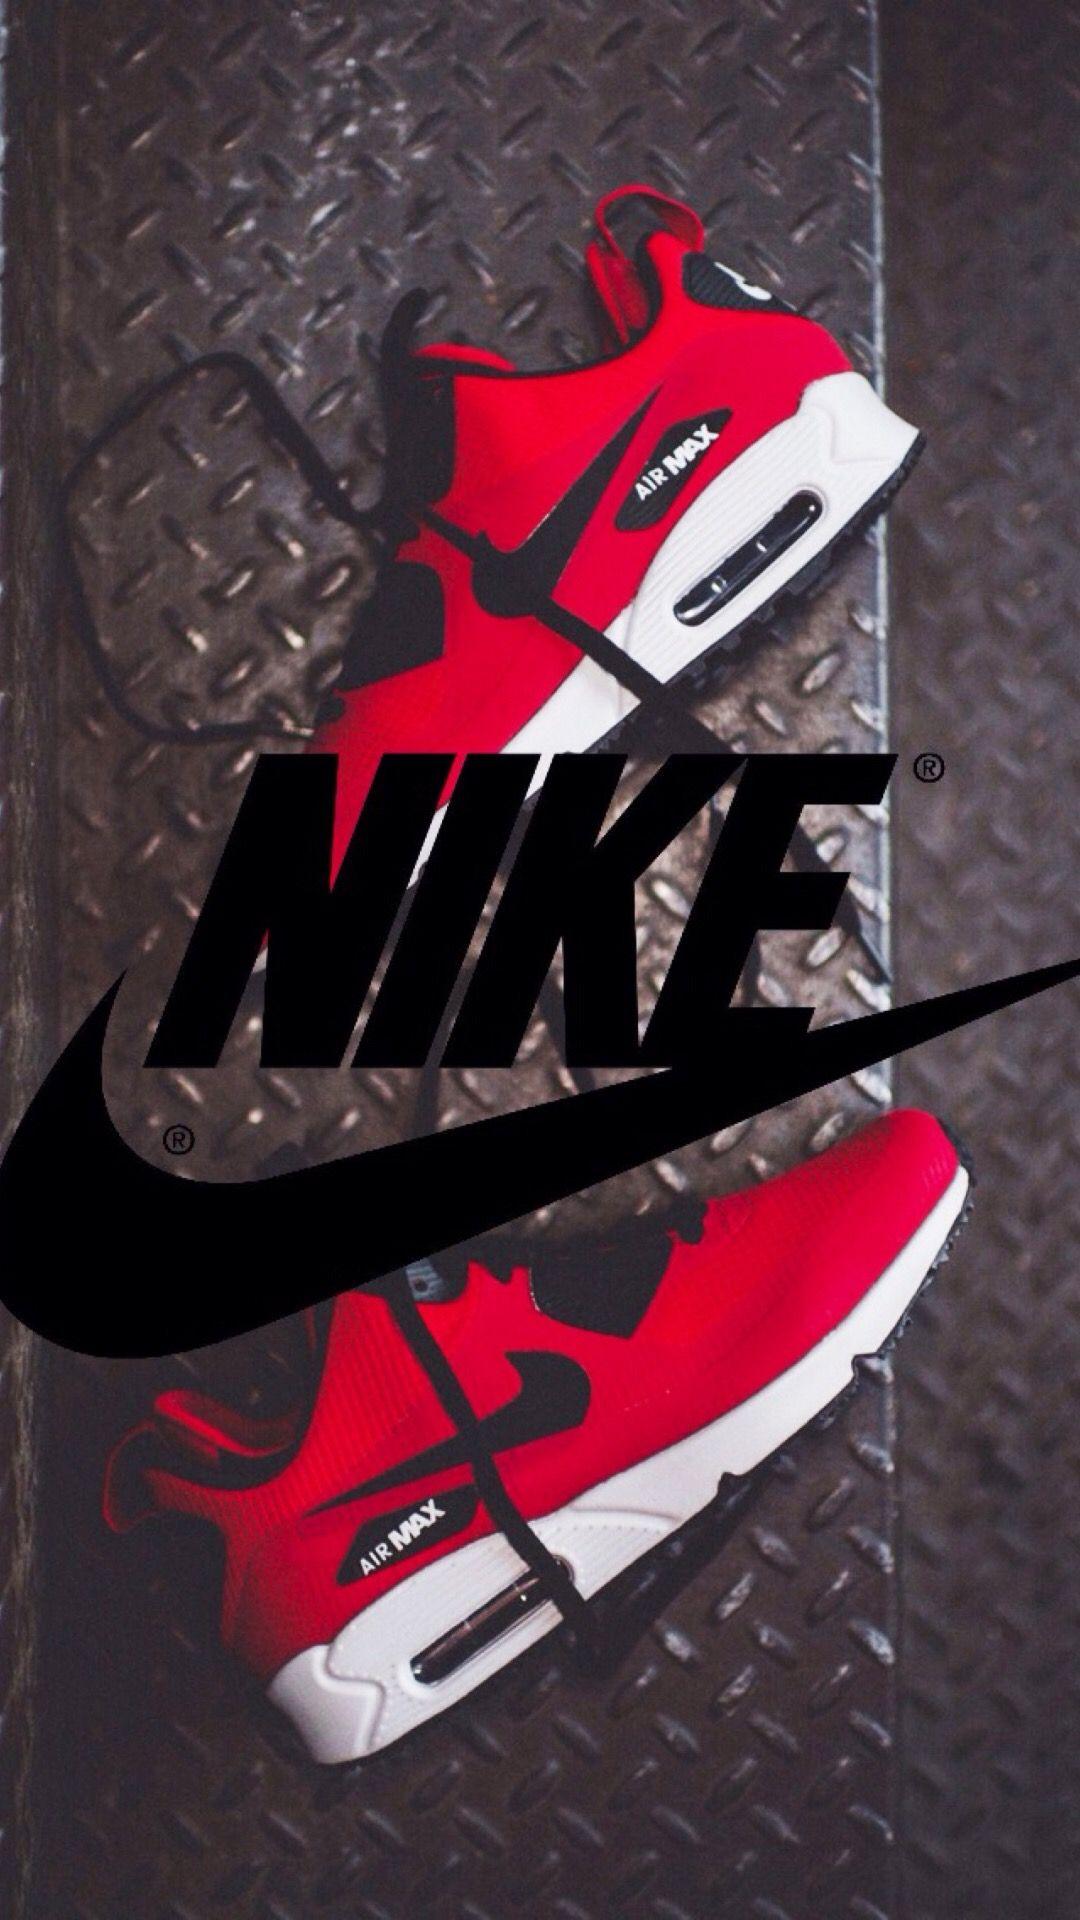 De NikeFondos Para Pin Vindas Diego En Pantalla IphoneFondo W9IHbEDYe2